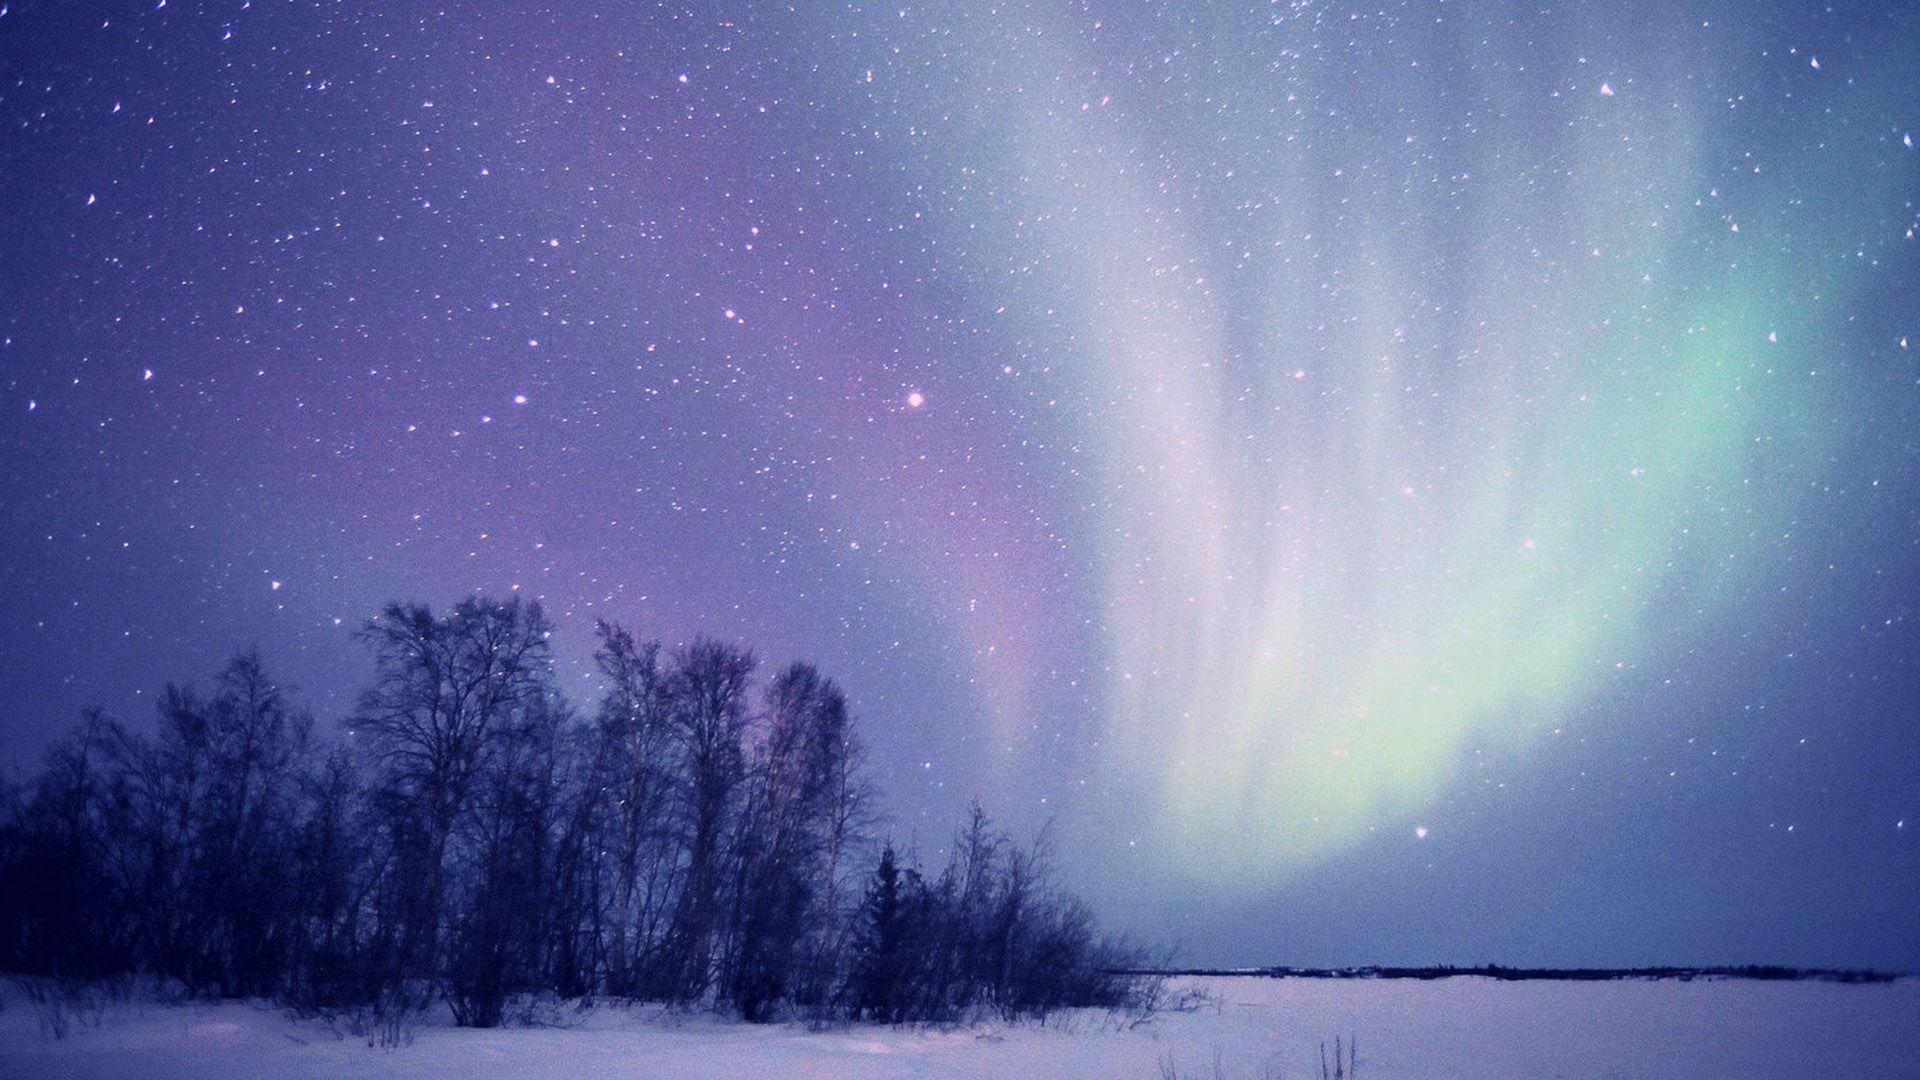 Pin By Lavenderlovespell On Wanderlust Aurora Borealis Northern Lights Wallpaper Aurora Borealis Northern Lights